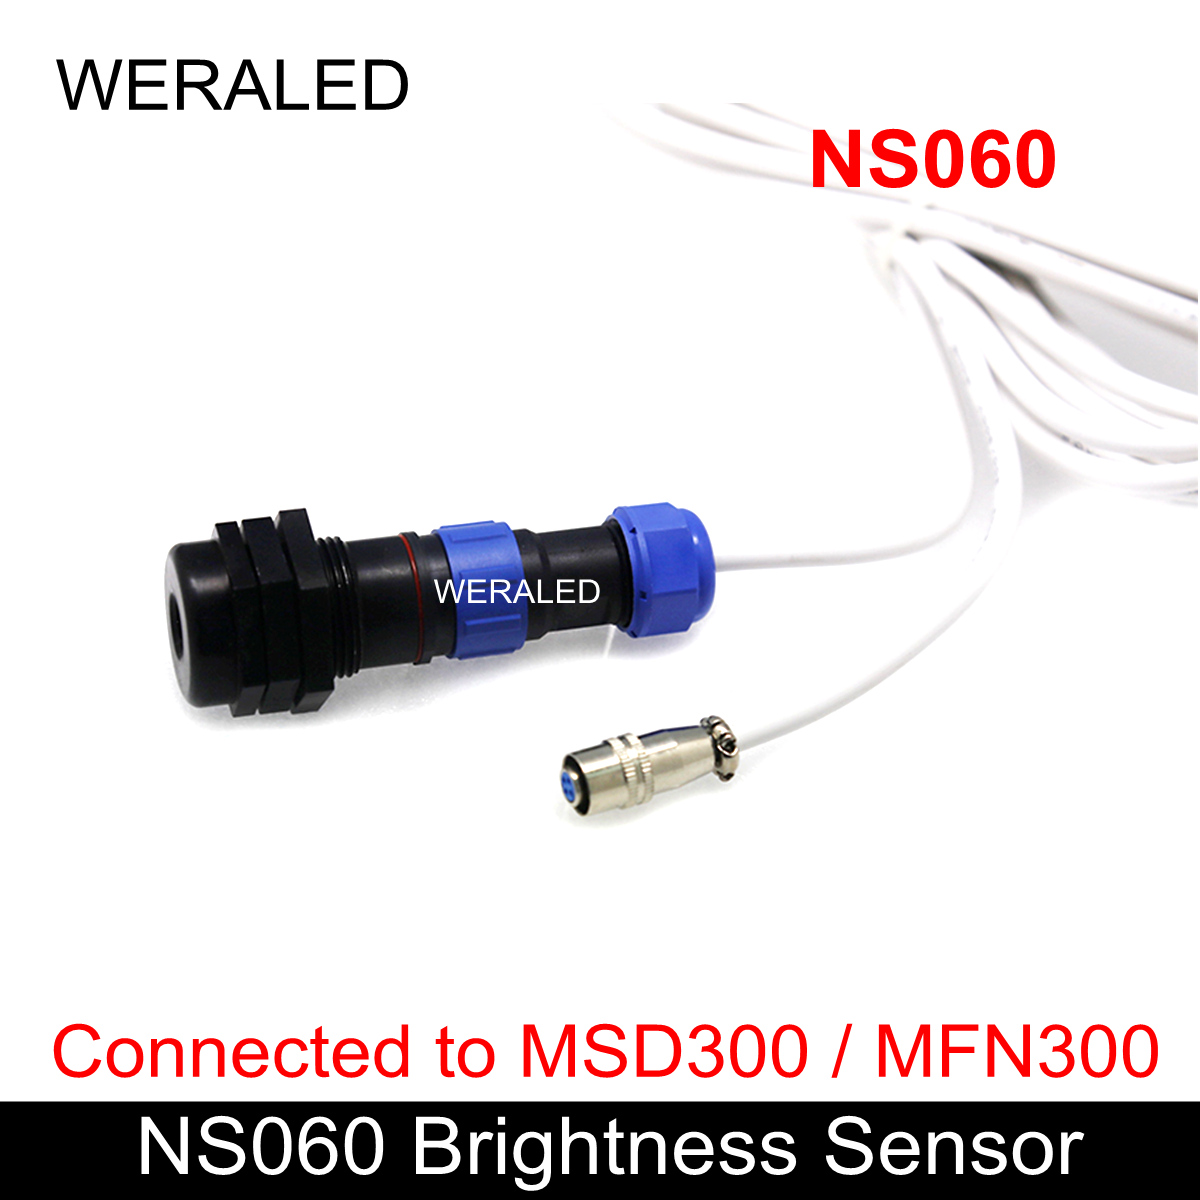 Novastar NS060 Light Sensor,Ambient Brightness Sensor, Work with MSD300/600 sending ,T3 Asynchronous and MFN300 card)Novastar NS060 Light Sensor,Ambient Brightness Sensor, Work with MSD300/600 sending ,T3 Asynchronous and MFN300 card)